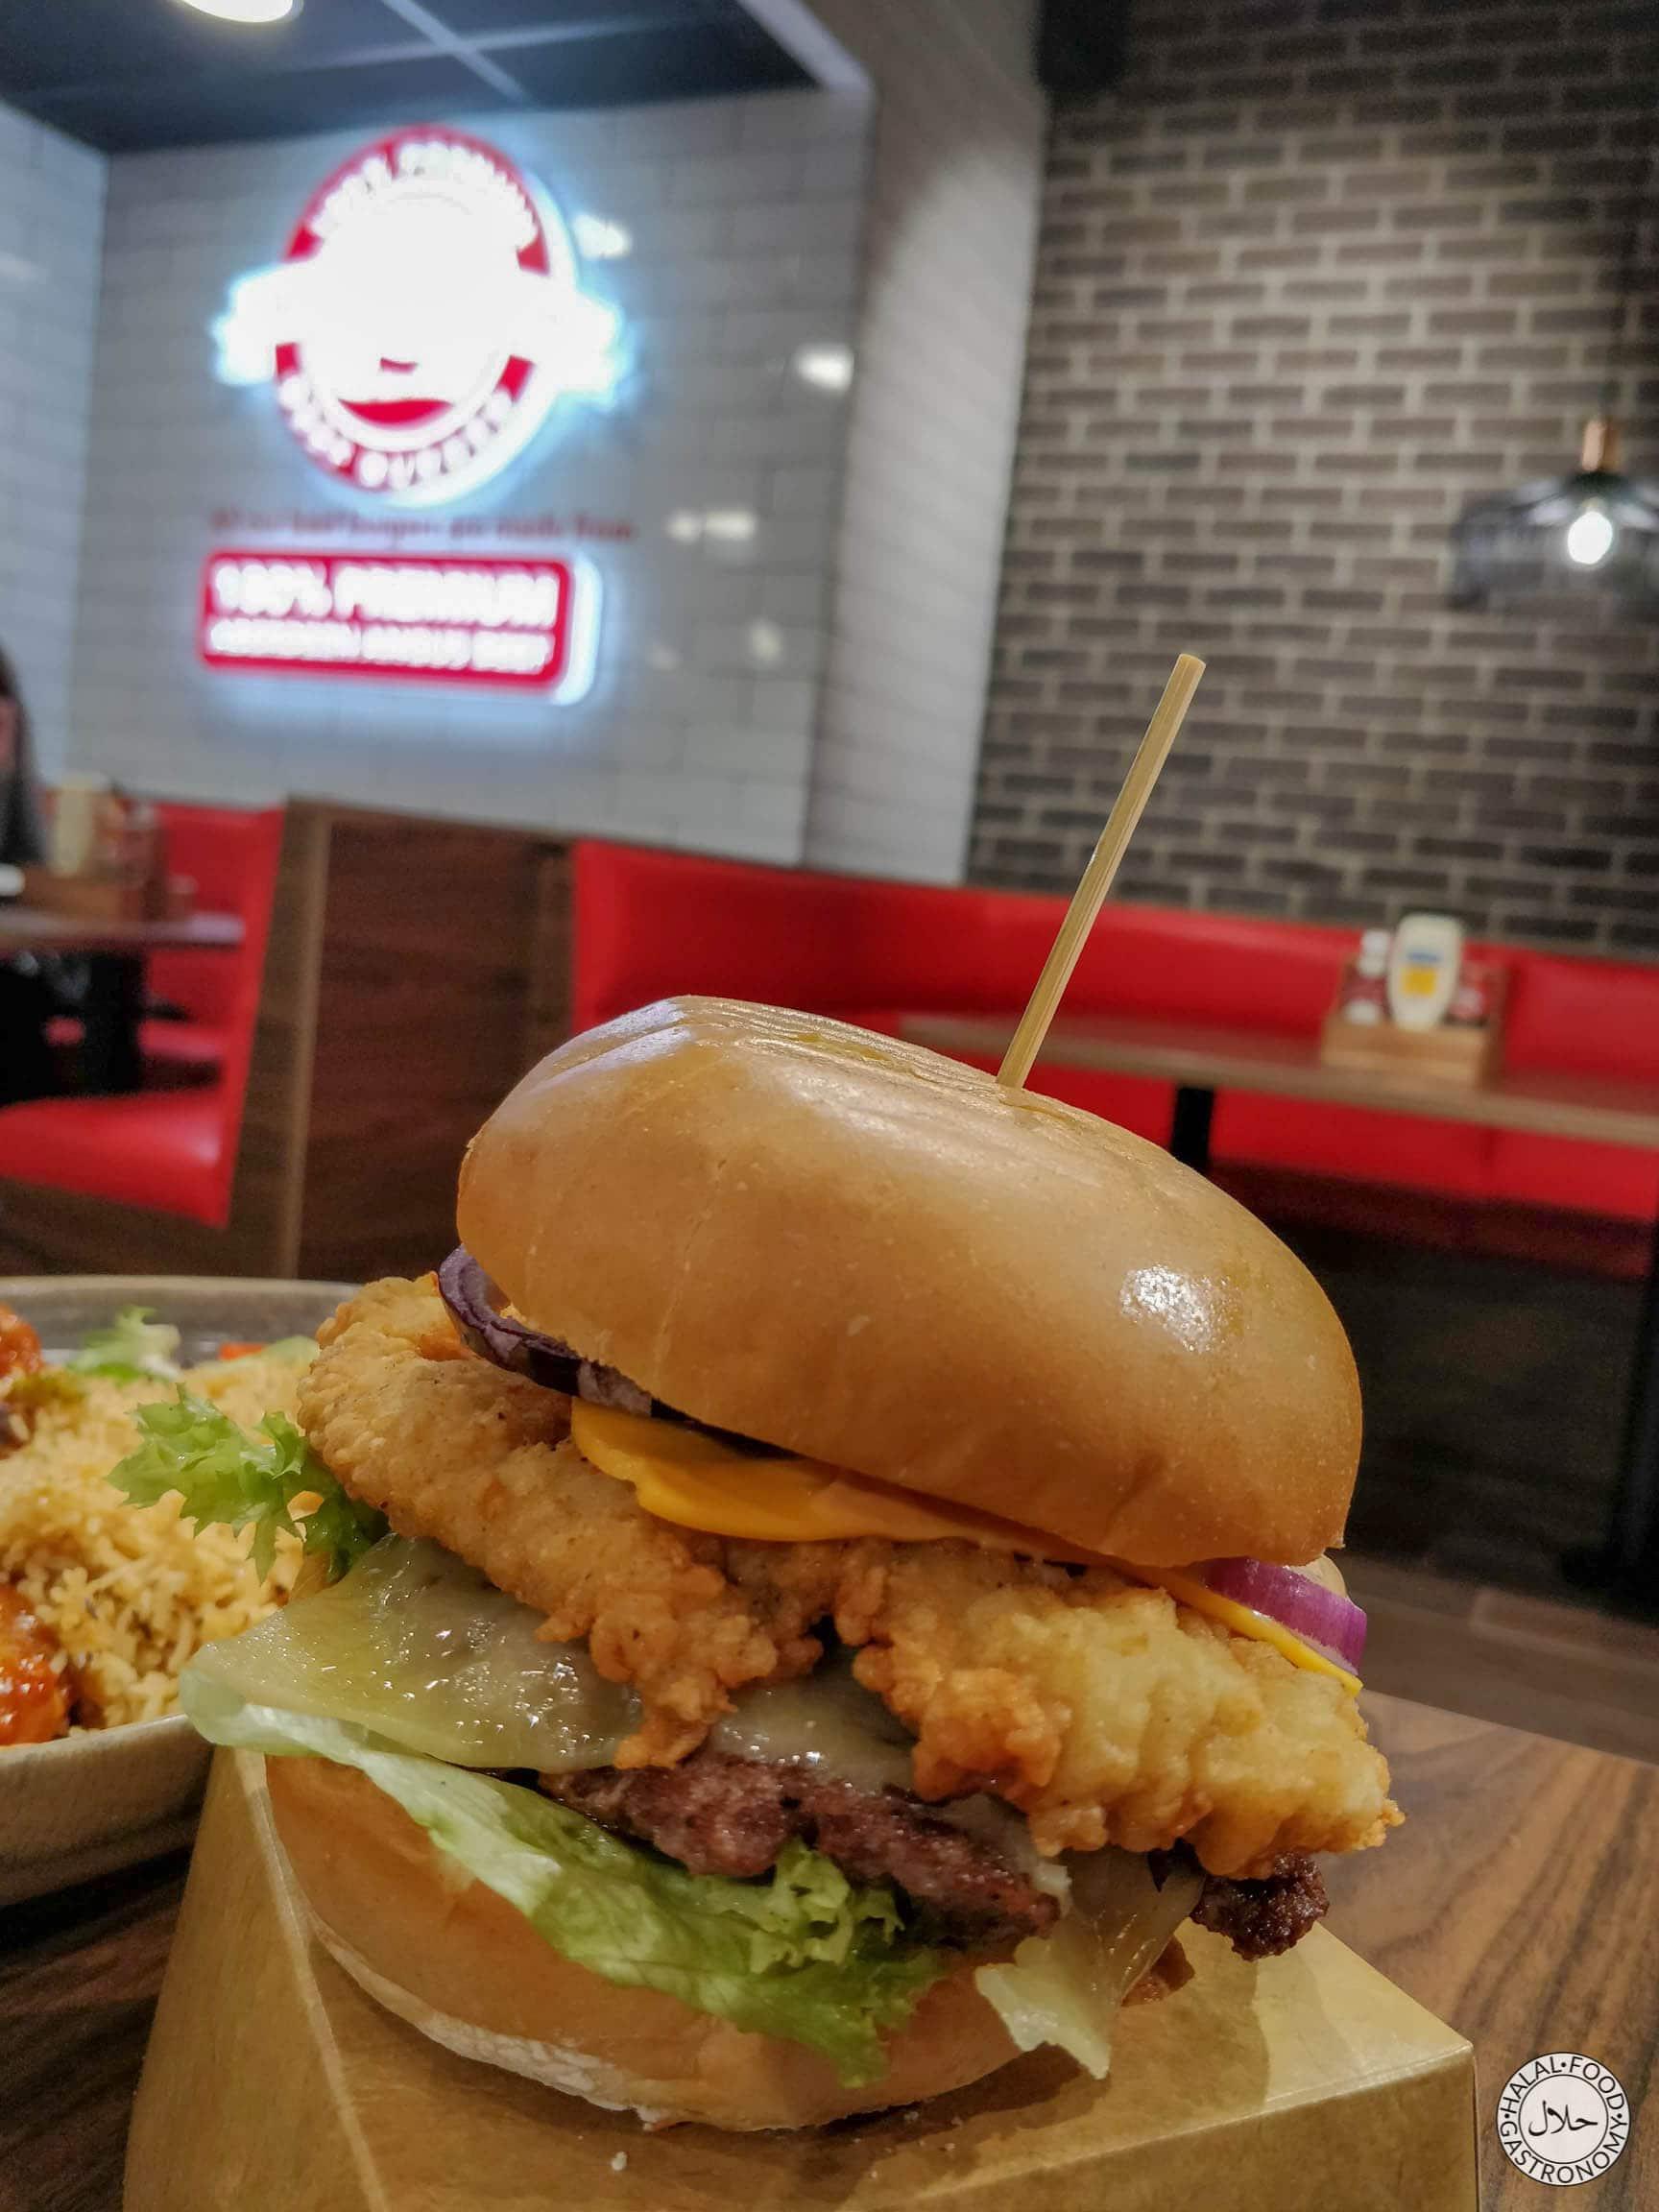 Frankie's Burgers Blackburn Full Review & Menu's - HMC Certified